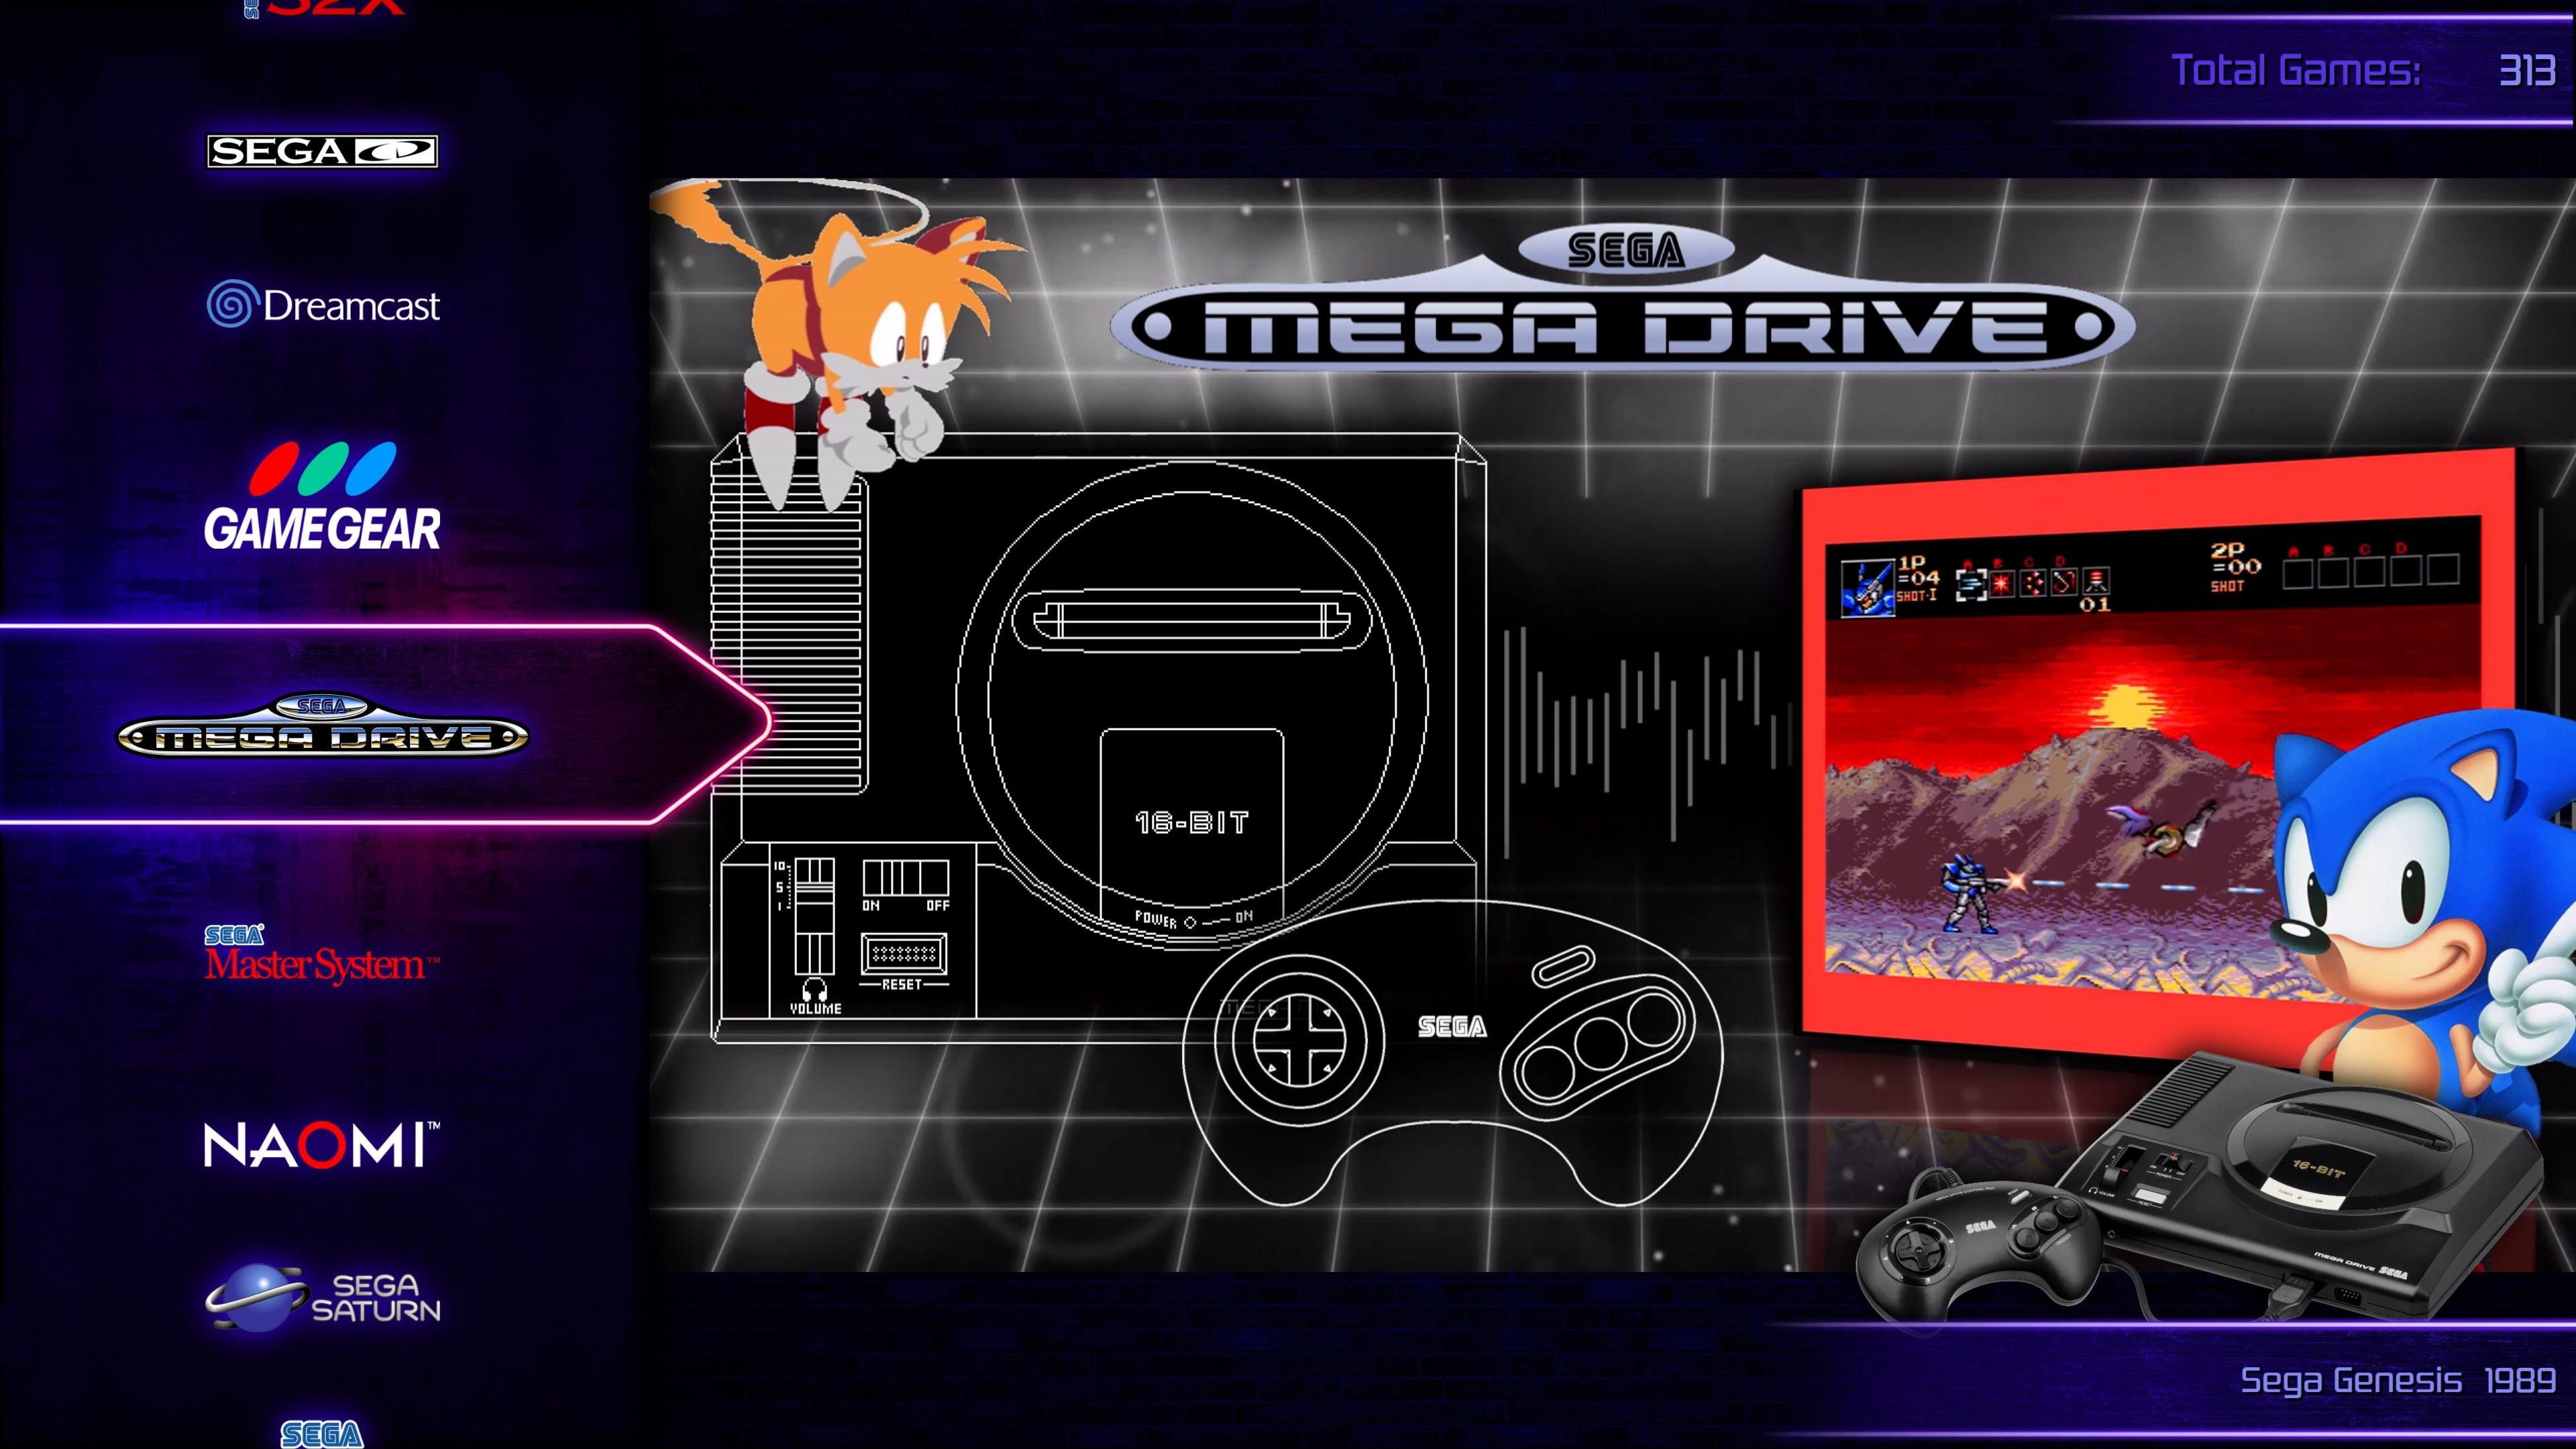 Neon Deluxe Arcade - Final 16:9 (Big Box Theme) - Page 2 - Big Box Custom Themes - LaunchBox Community Forums